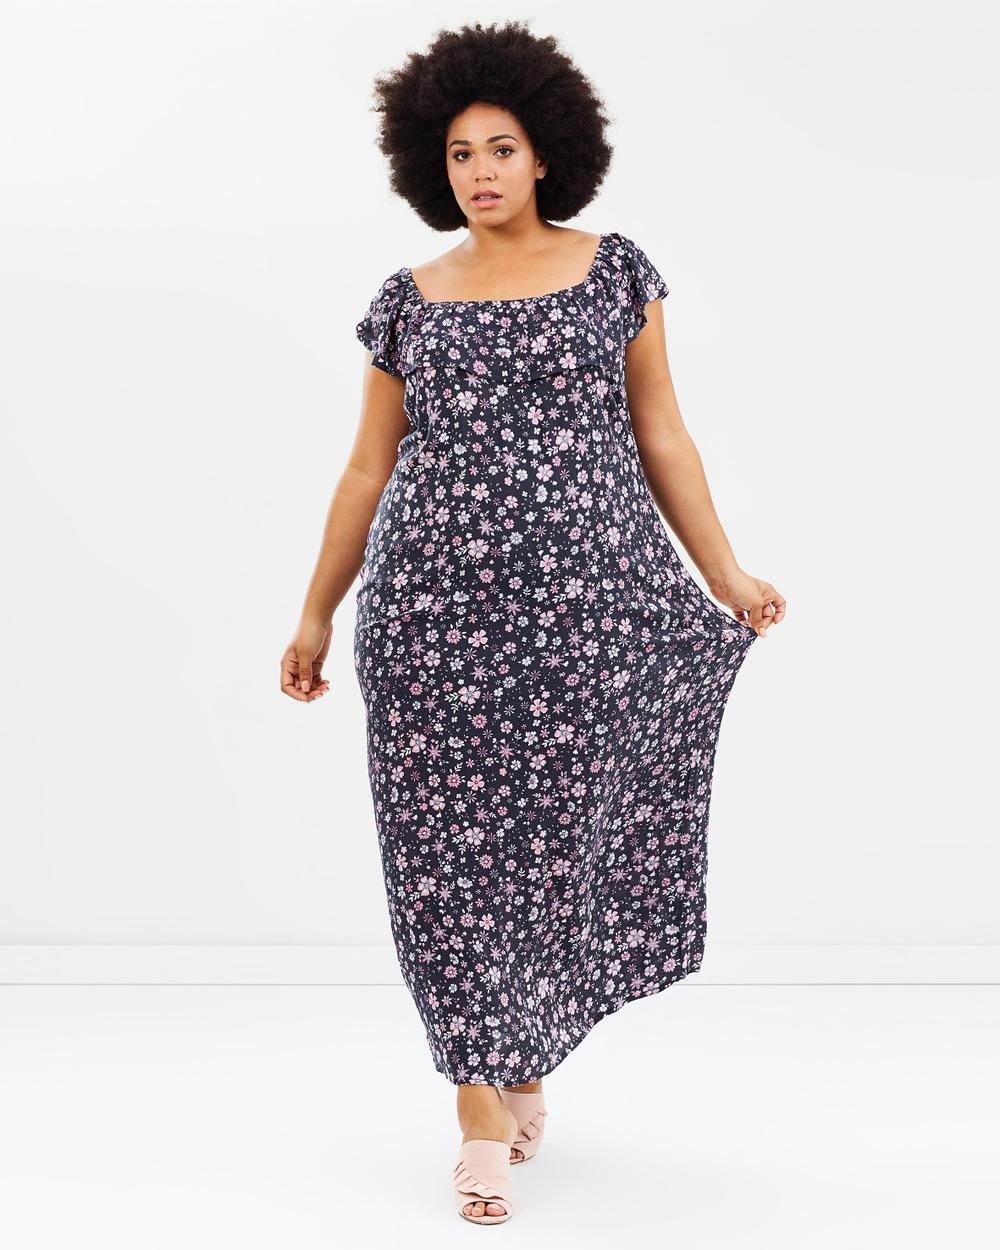 EVANS Floral Gypsy Maxi Dress Dresses Dark Multi Floral Gypsy Maxi Dress